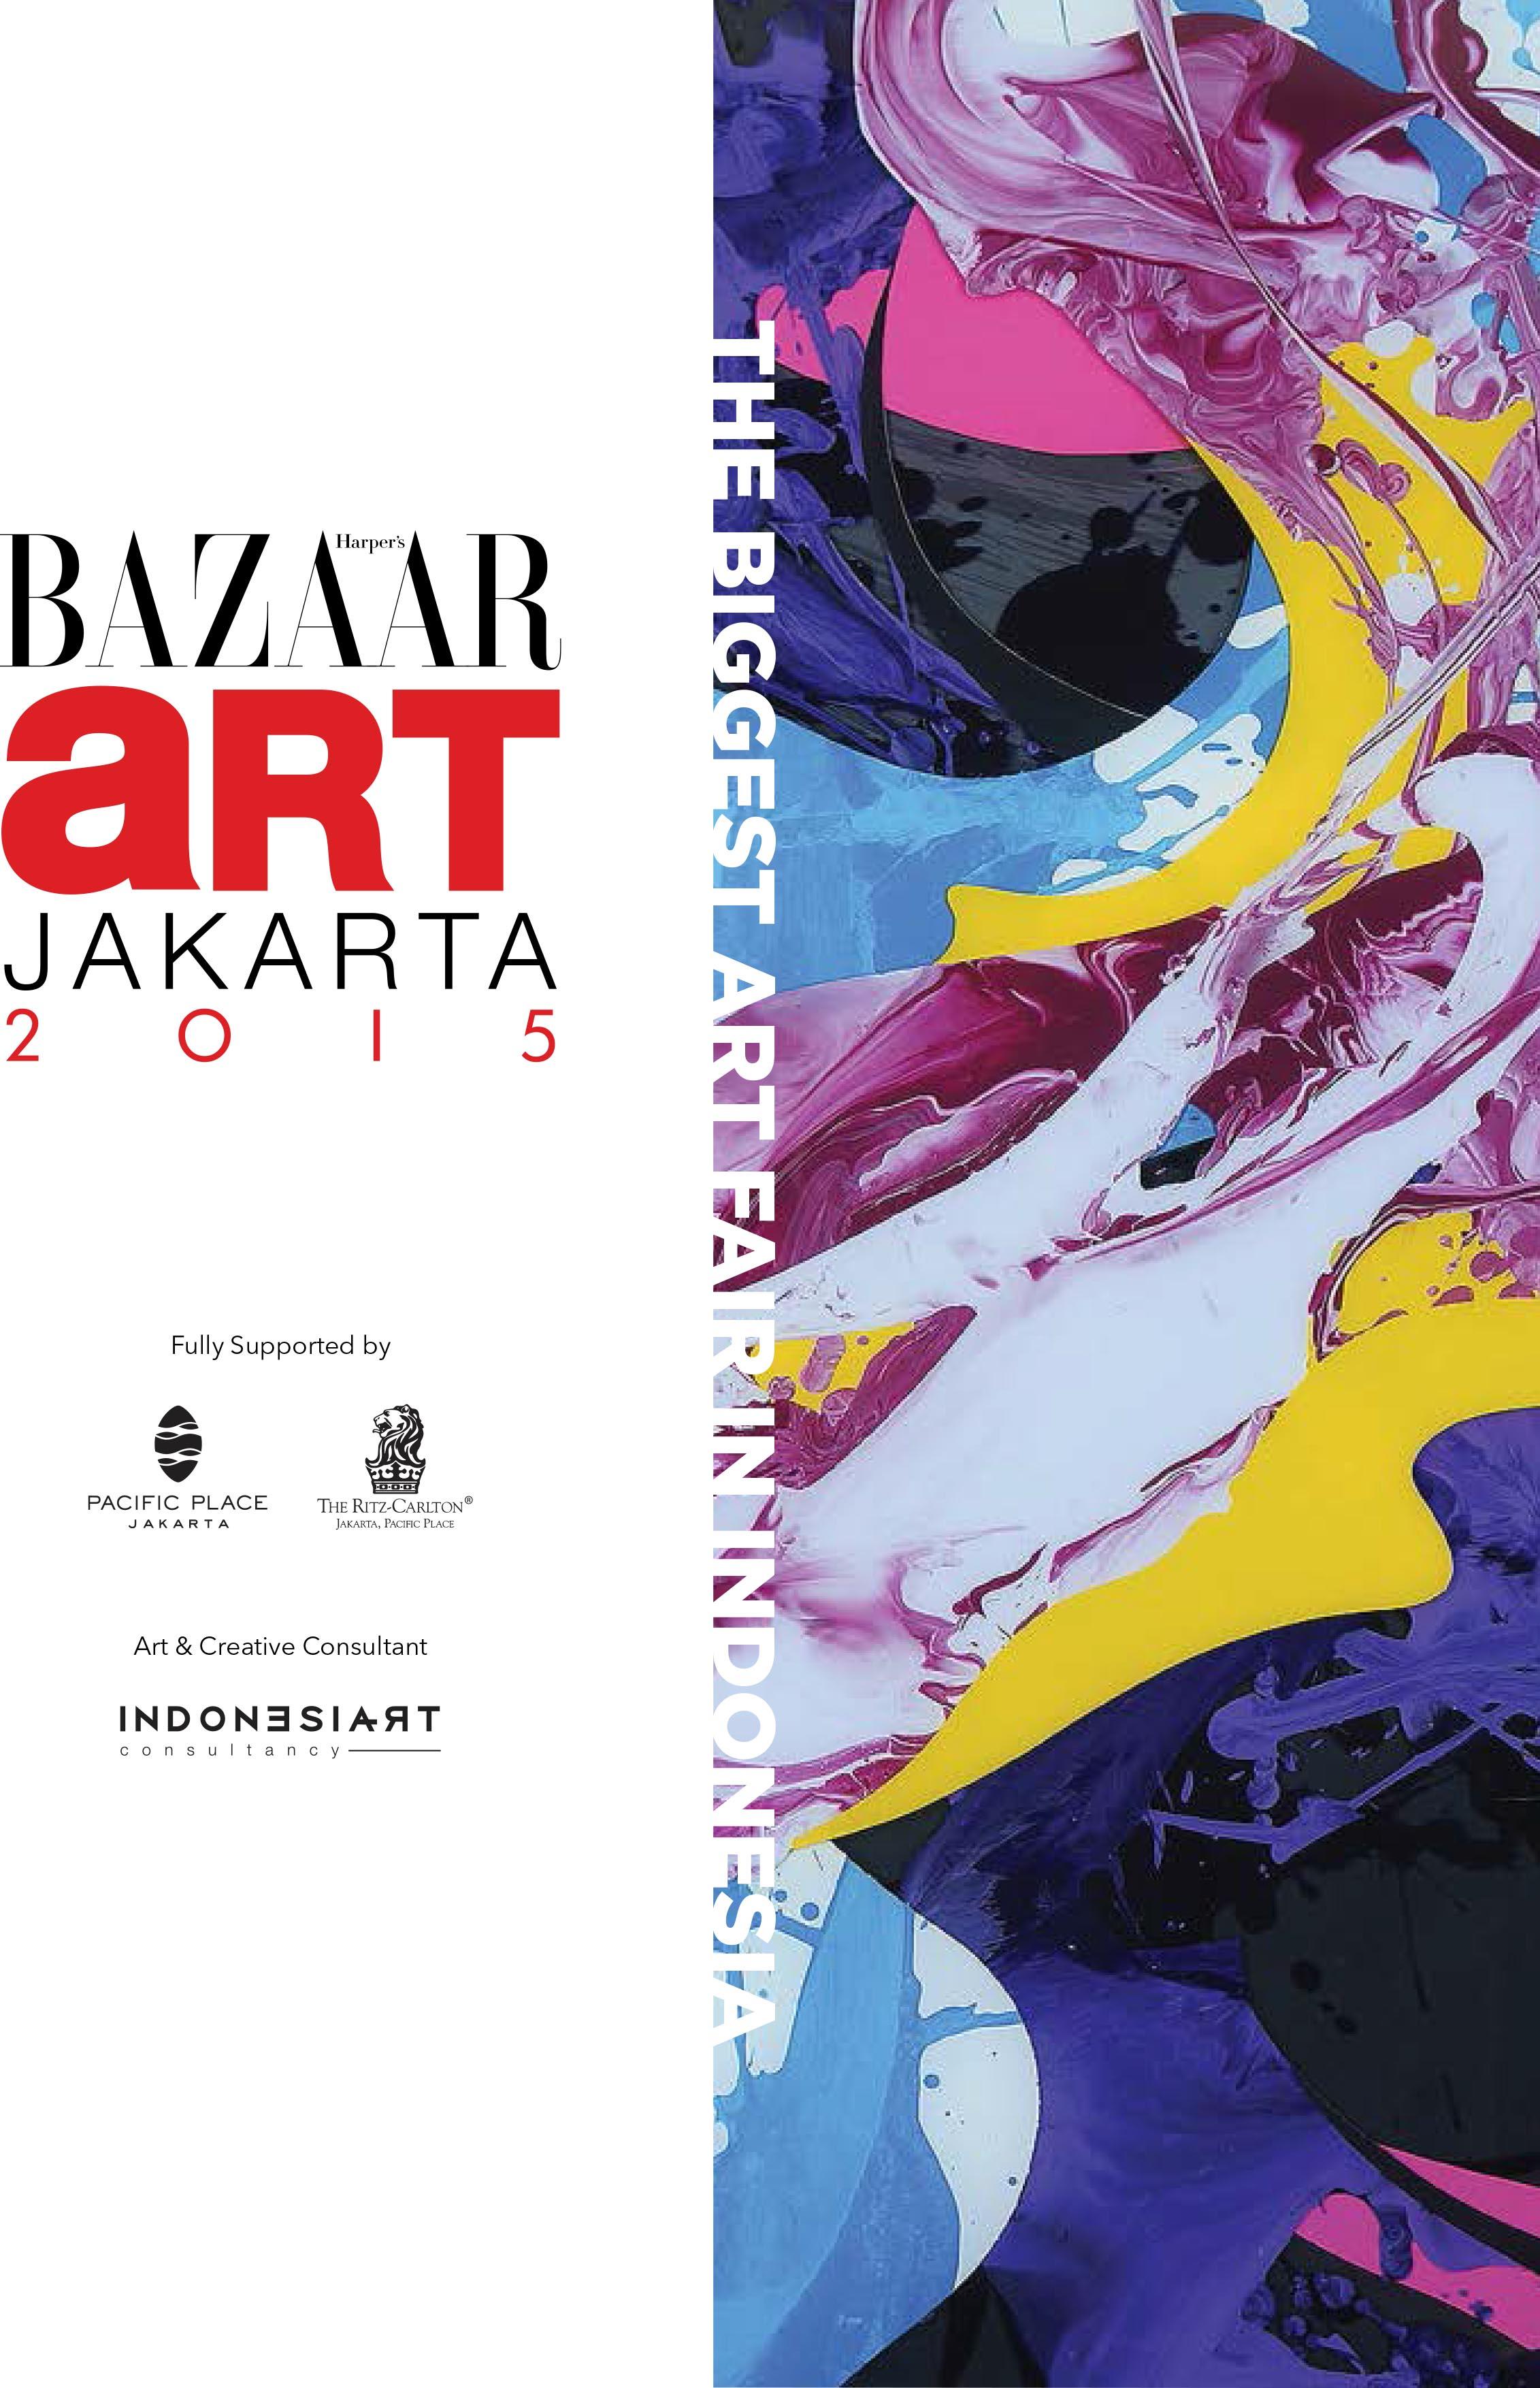 BAJ15 PRESS RELEASE 1 MUHER expondrá en la Bazaar Art de Yakarta 2015 (Indonesia)